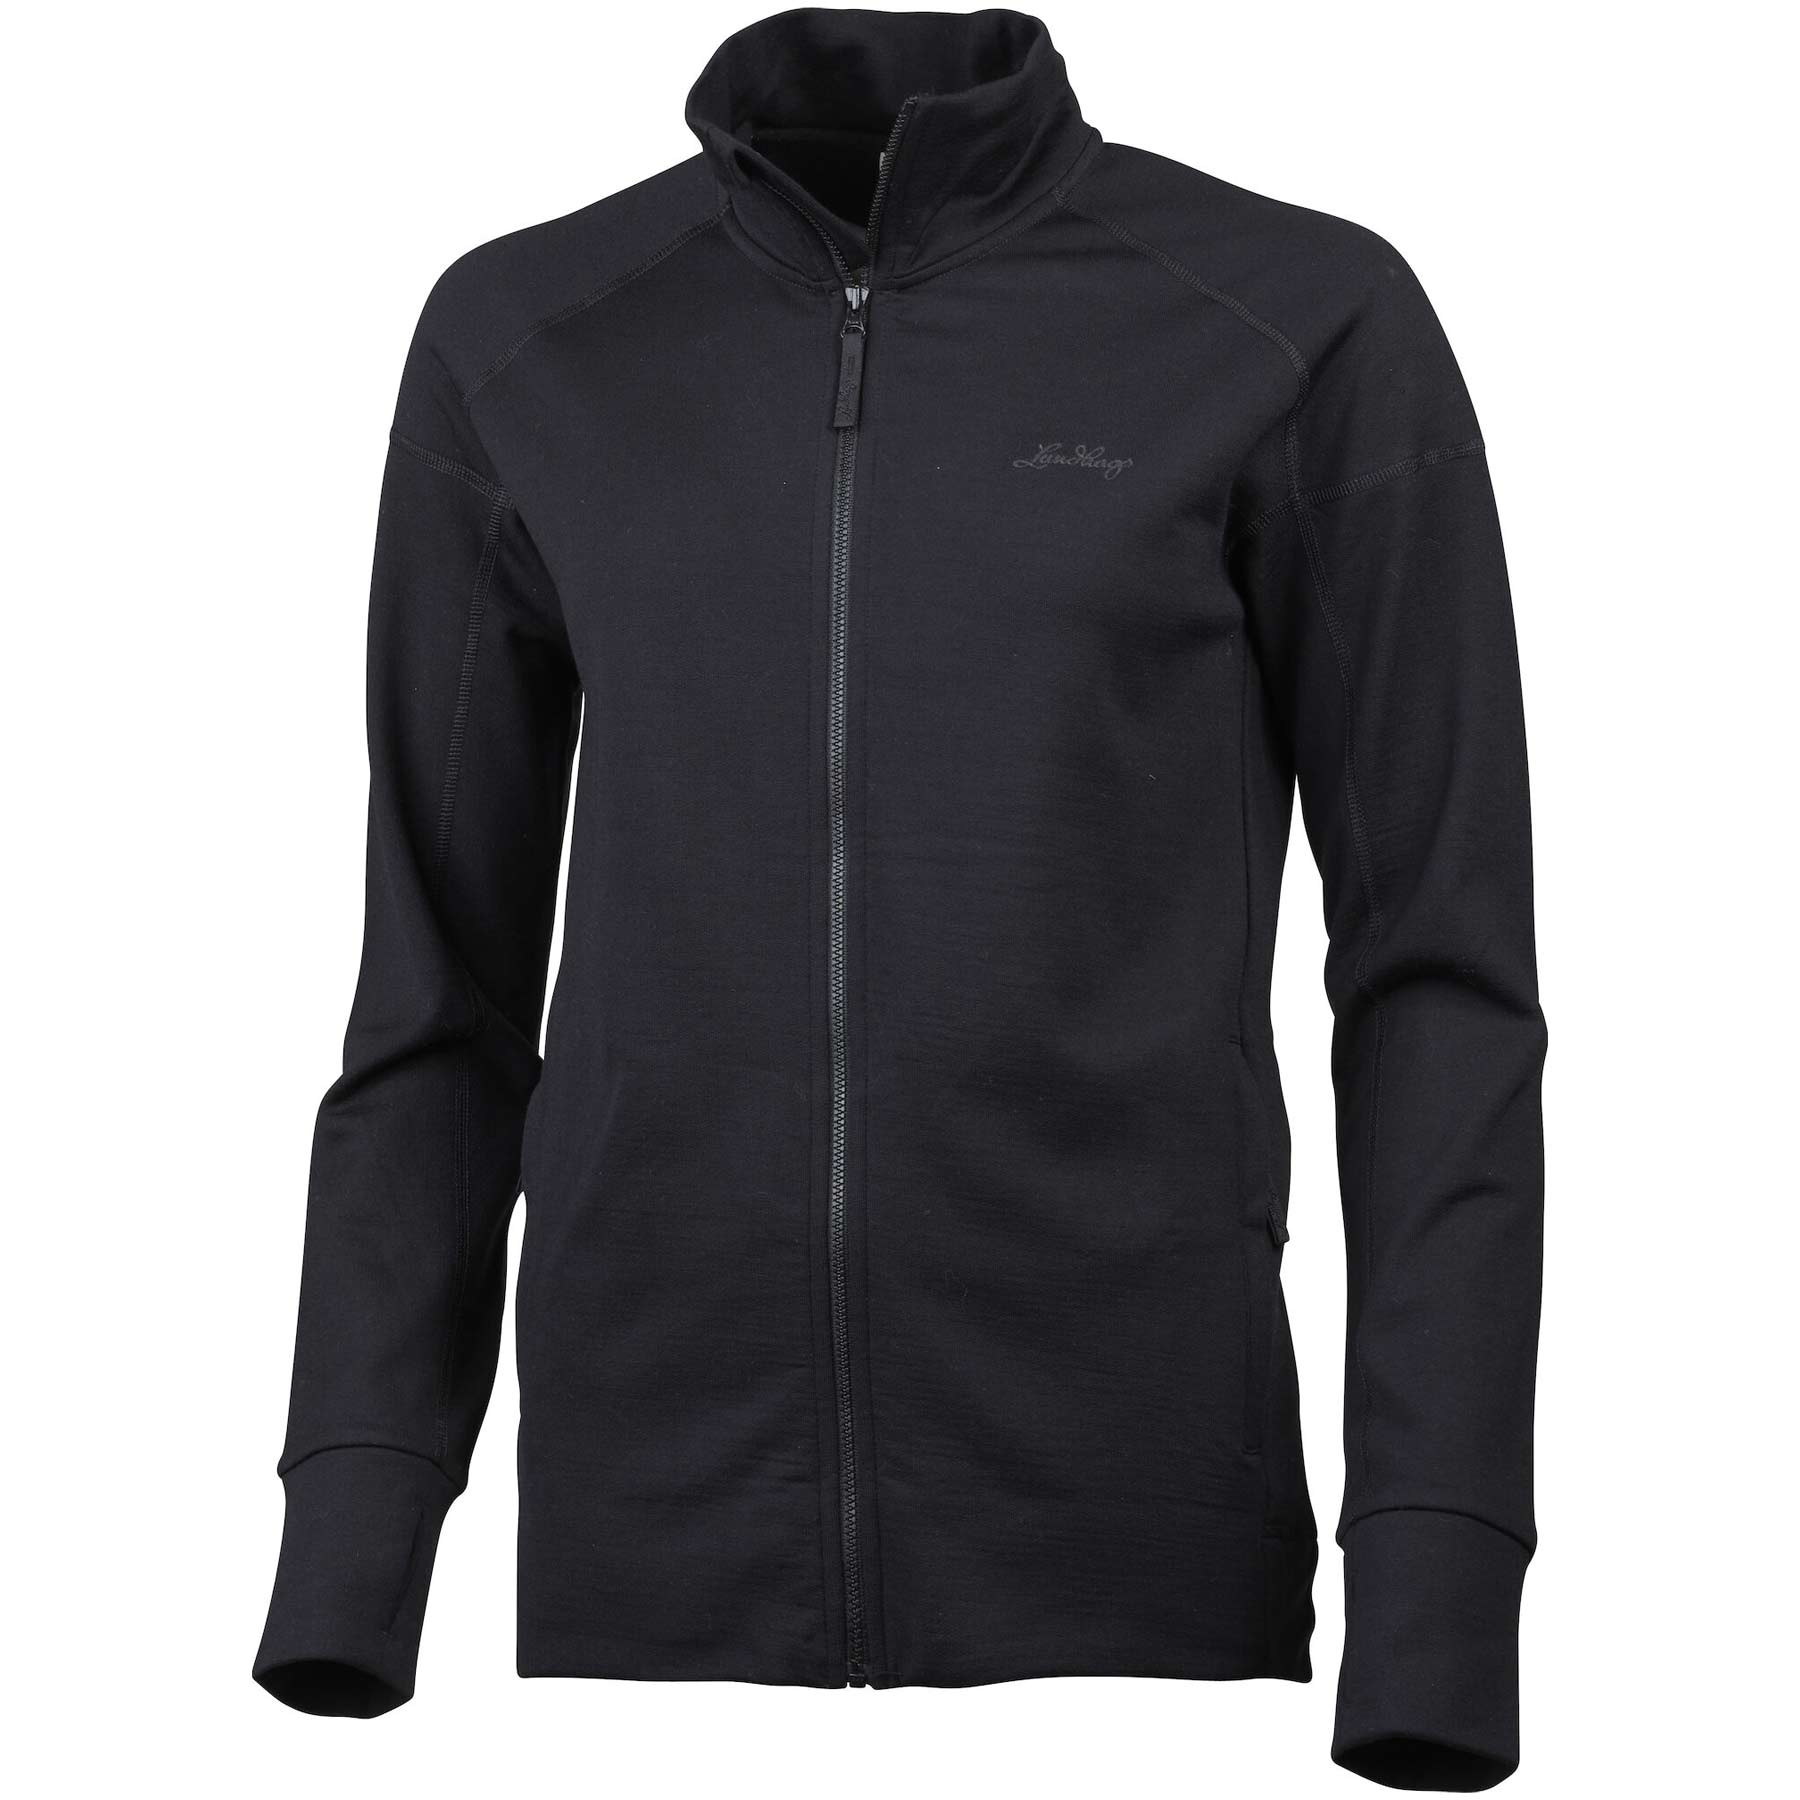 Lundhags Ullto Merino Full Zip Women's Jacket - Black 900